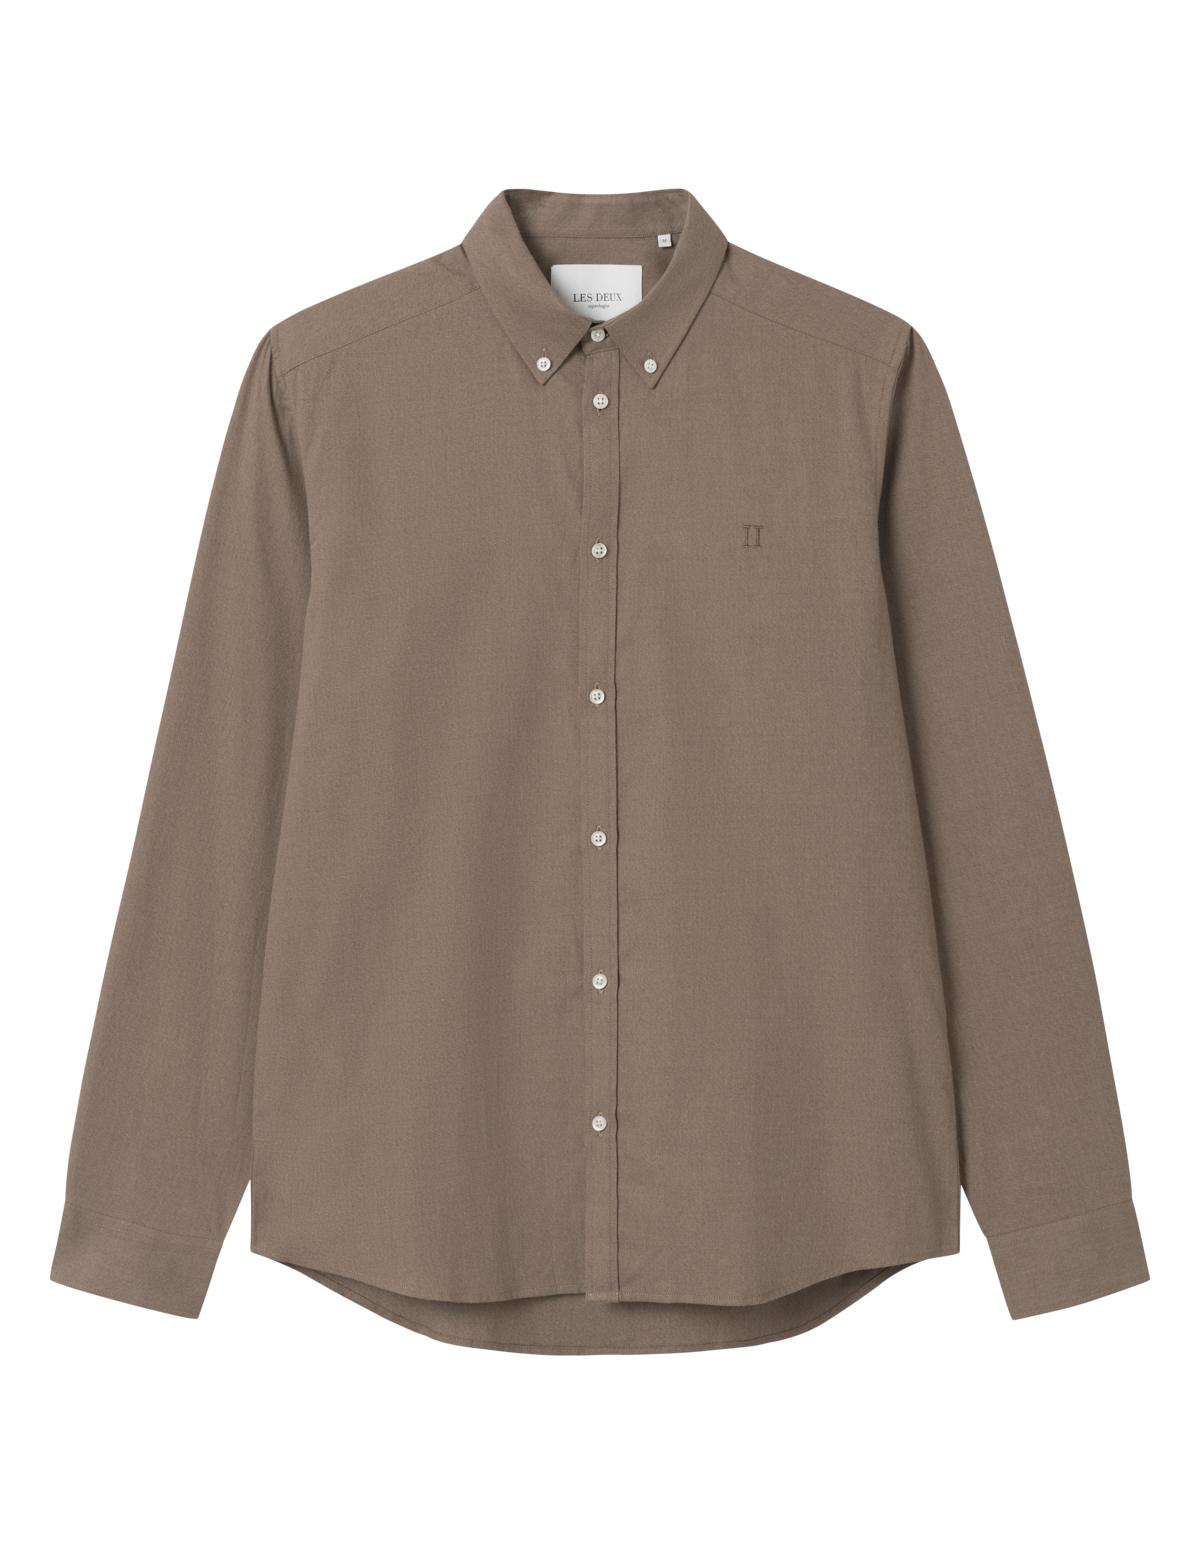 Les Deux Harrison B.D. Brushed skjorte, mountain grey, large